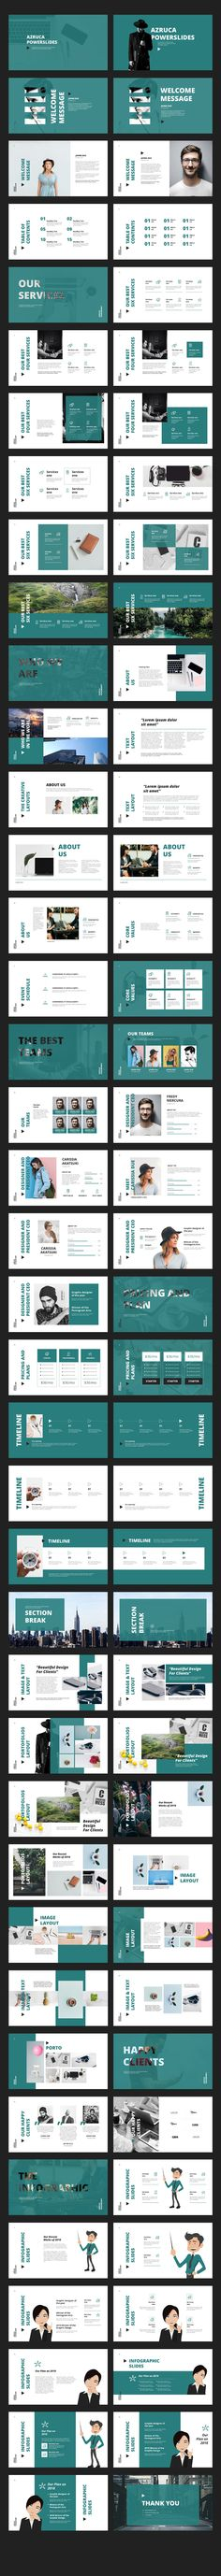 Azruca Powerpoint Templates - Creative PowerPoint Templates